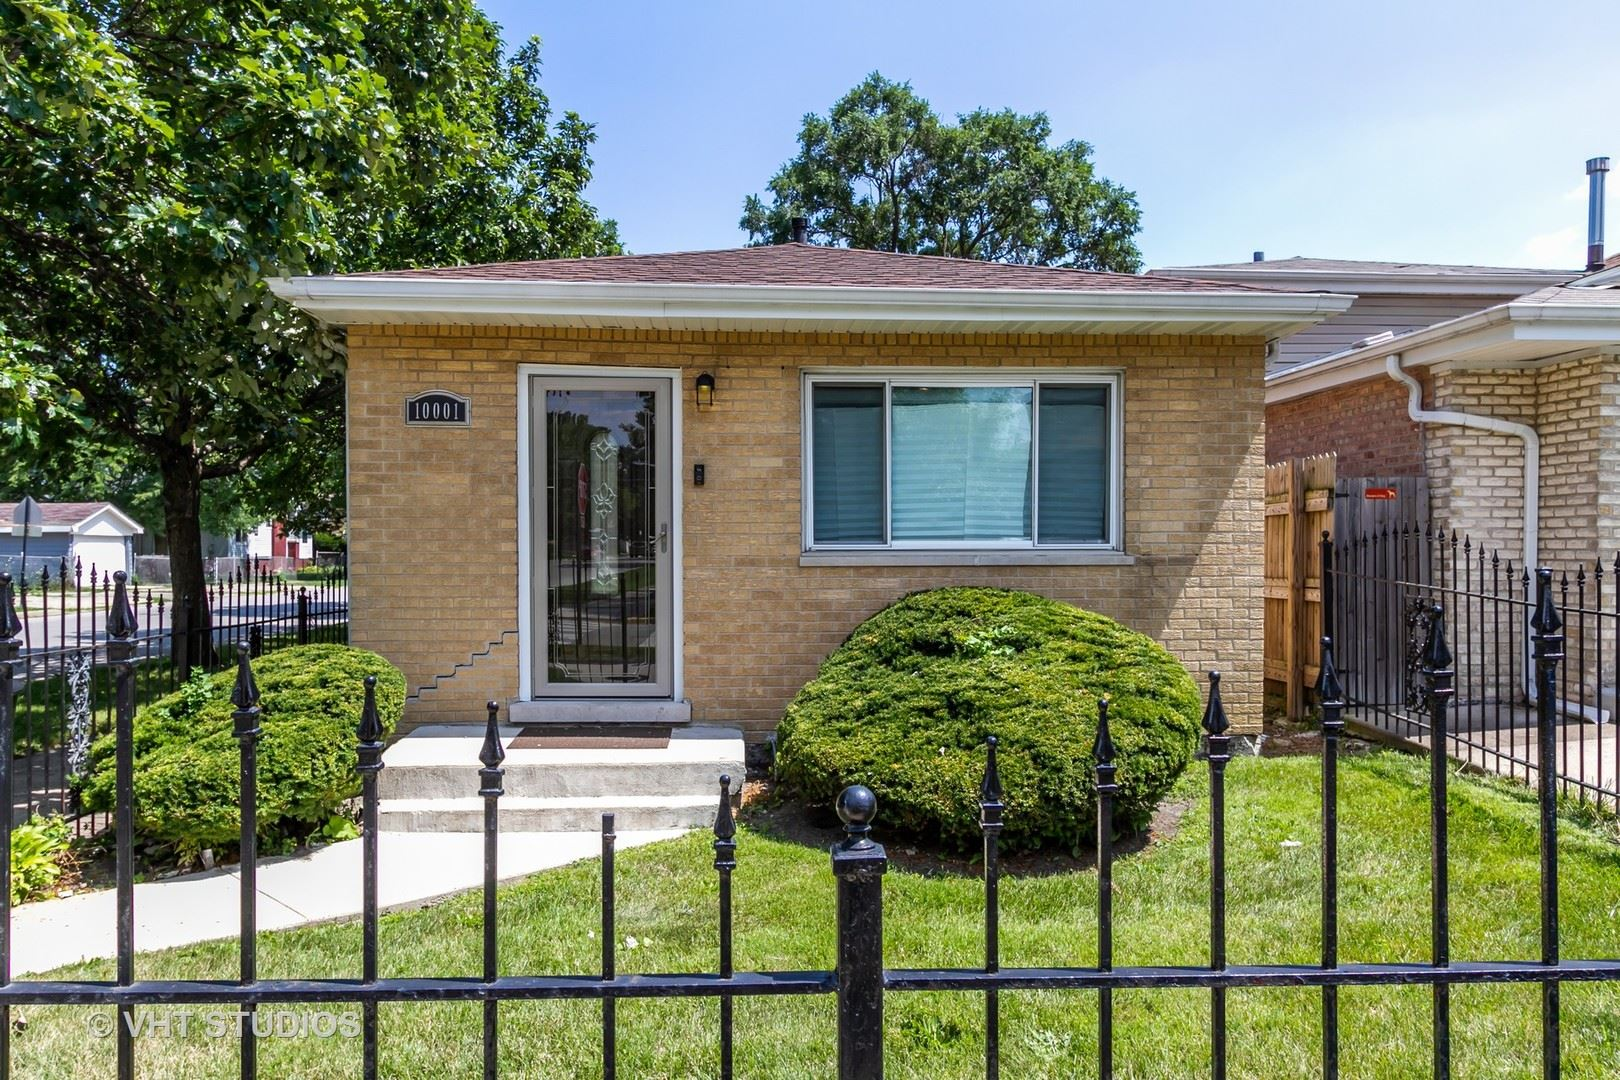 10001 S Lowe Avenue, Chicago, IL 60628 - #: 10811535